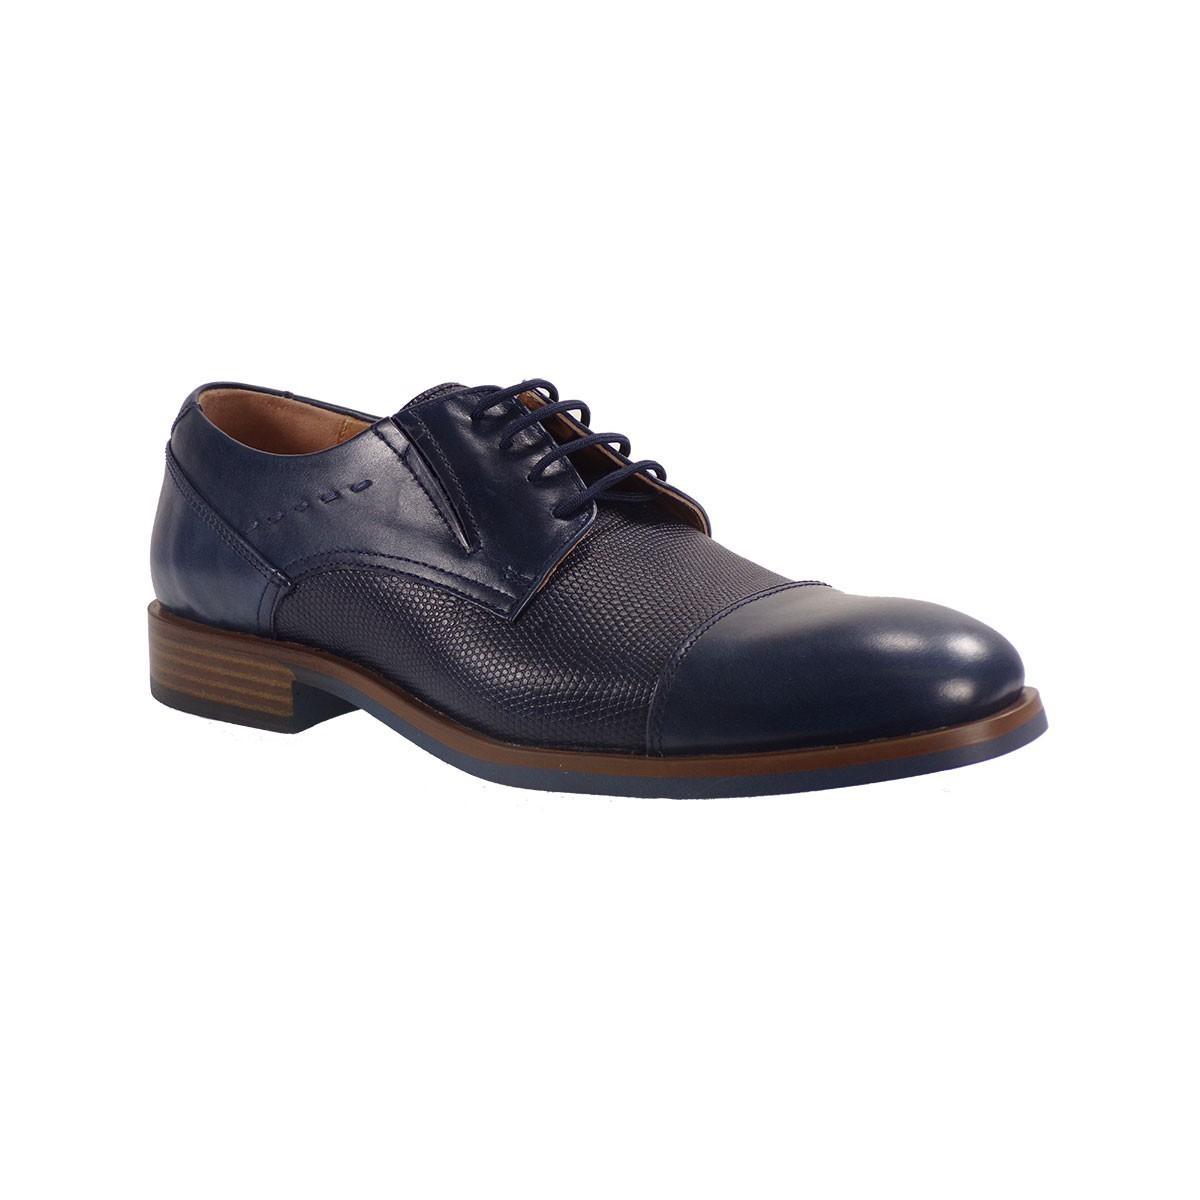 Commanchero Ανδρικά Παπούτσια 91664-927 Μπλέ Δέρμα